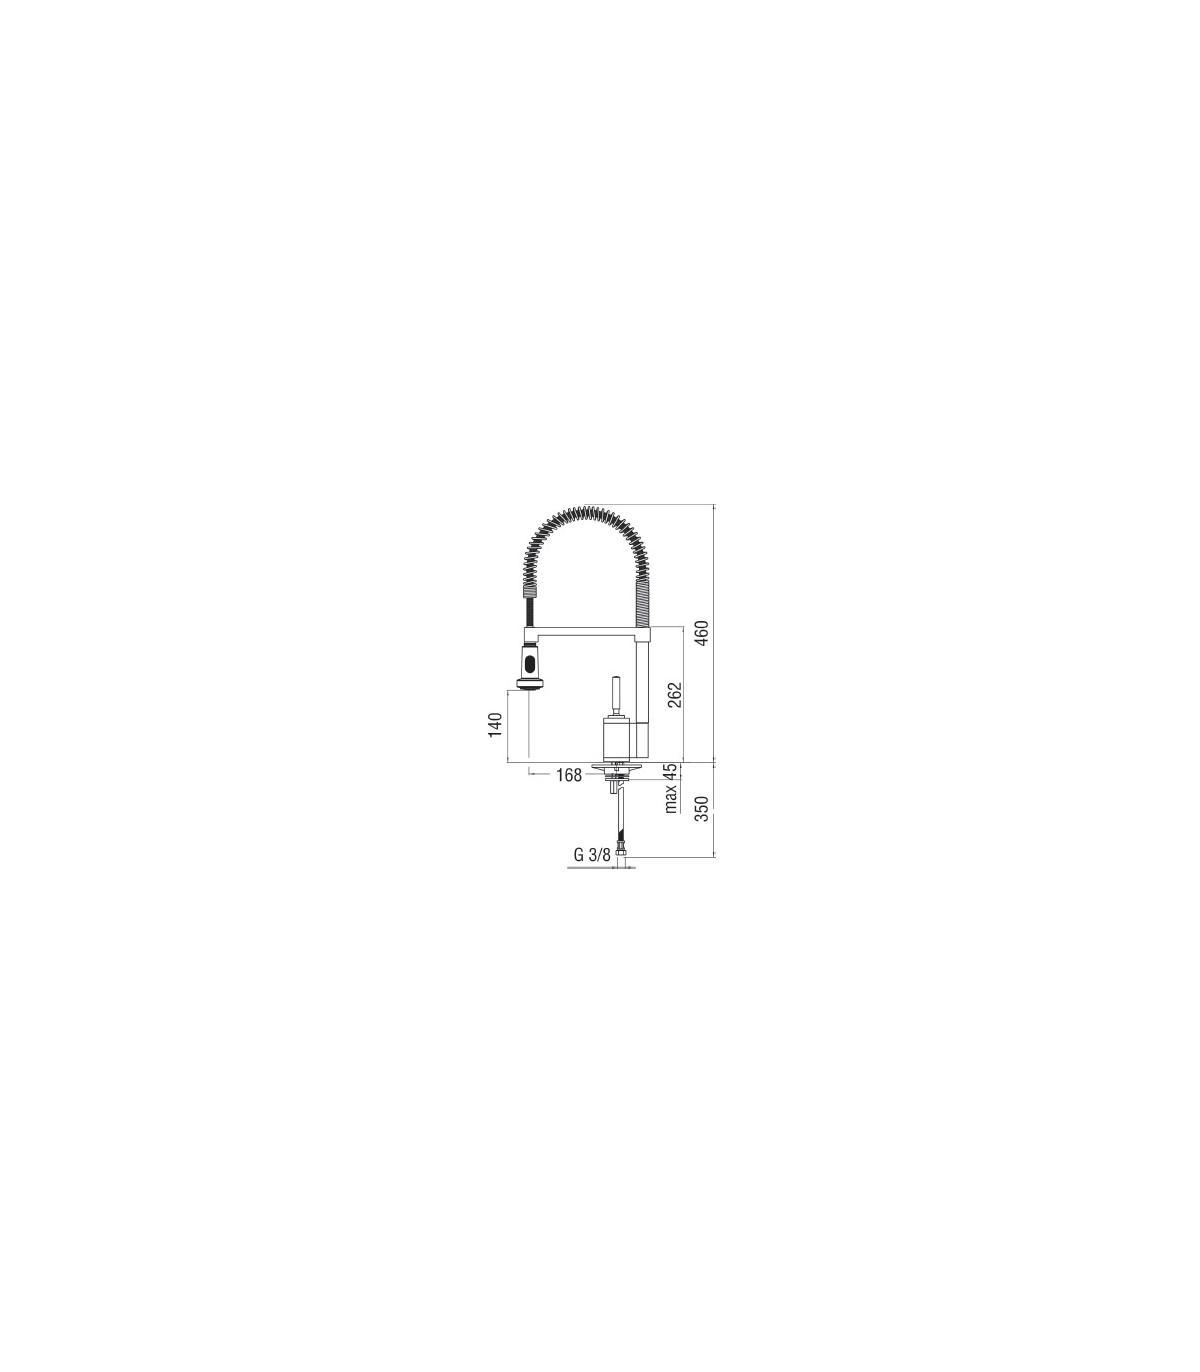 Sedile Wc Tesi Ideal Standard.Vaso Wc Sospeso Ideal Standard Tesi Aquablade Con Sedile Slim